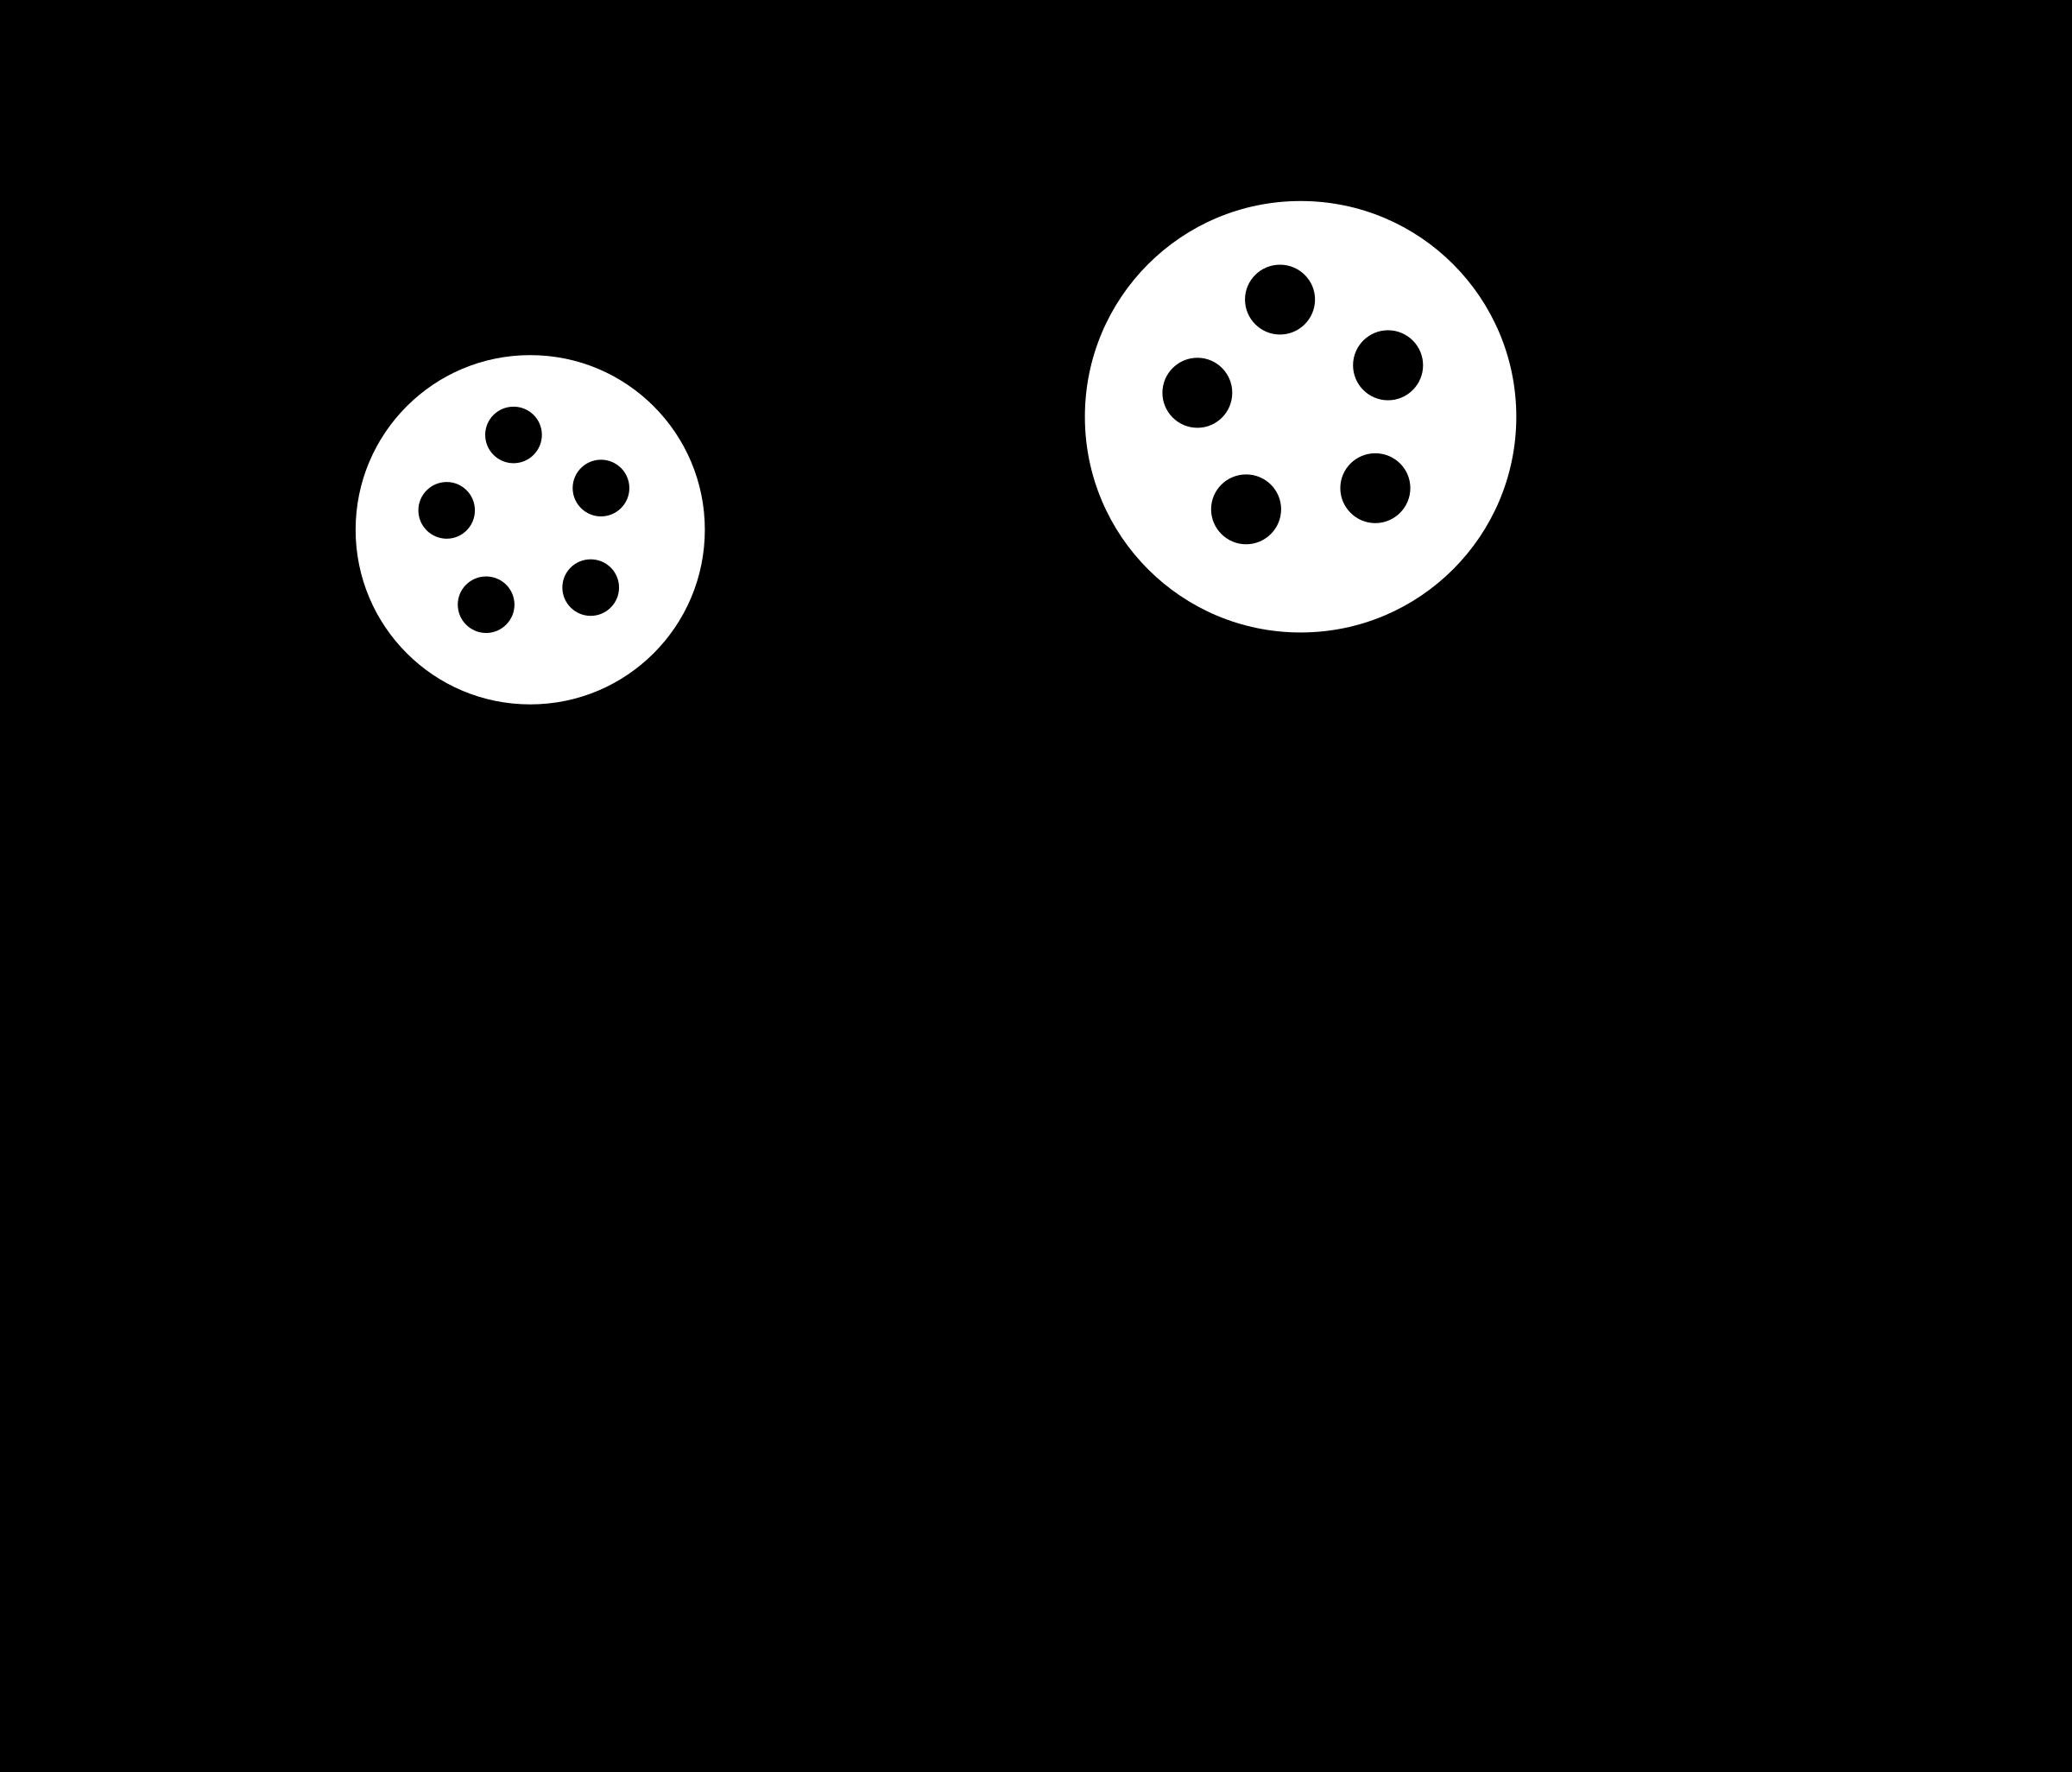 clip free download Film transparent old movie. Video camera clipart media.